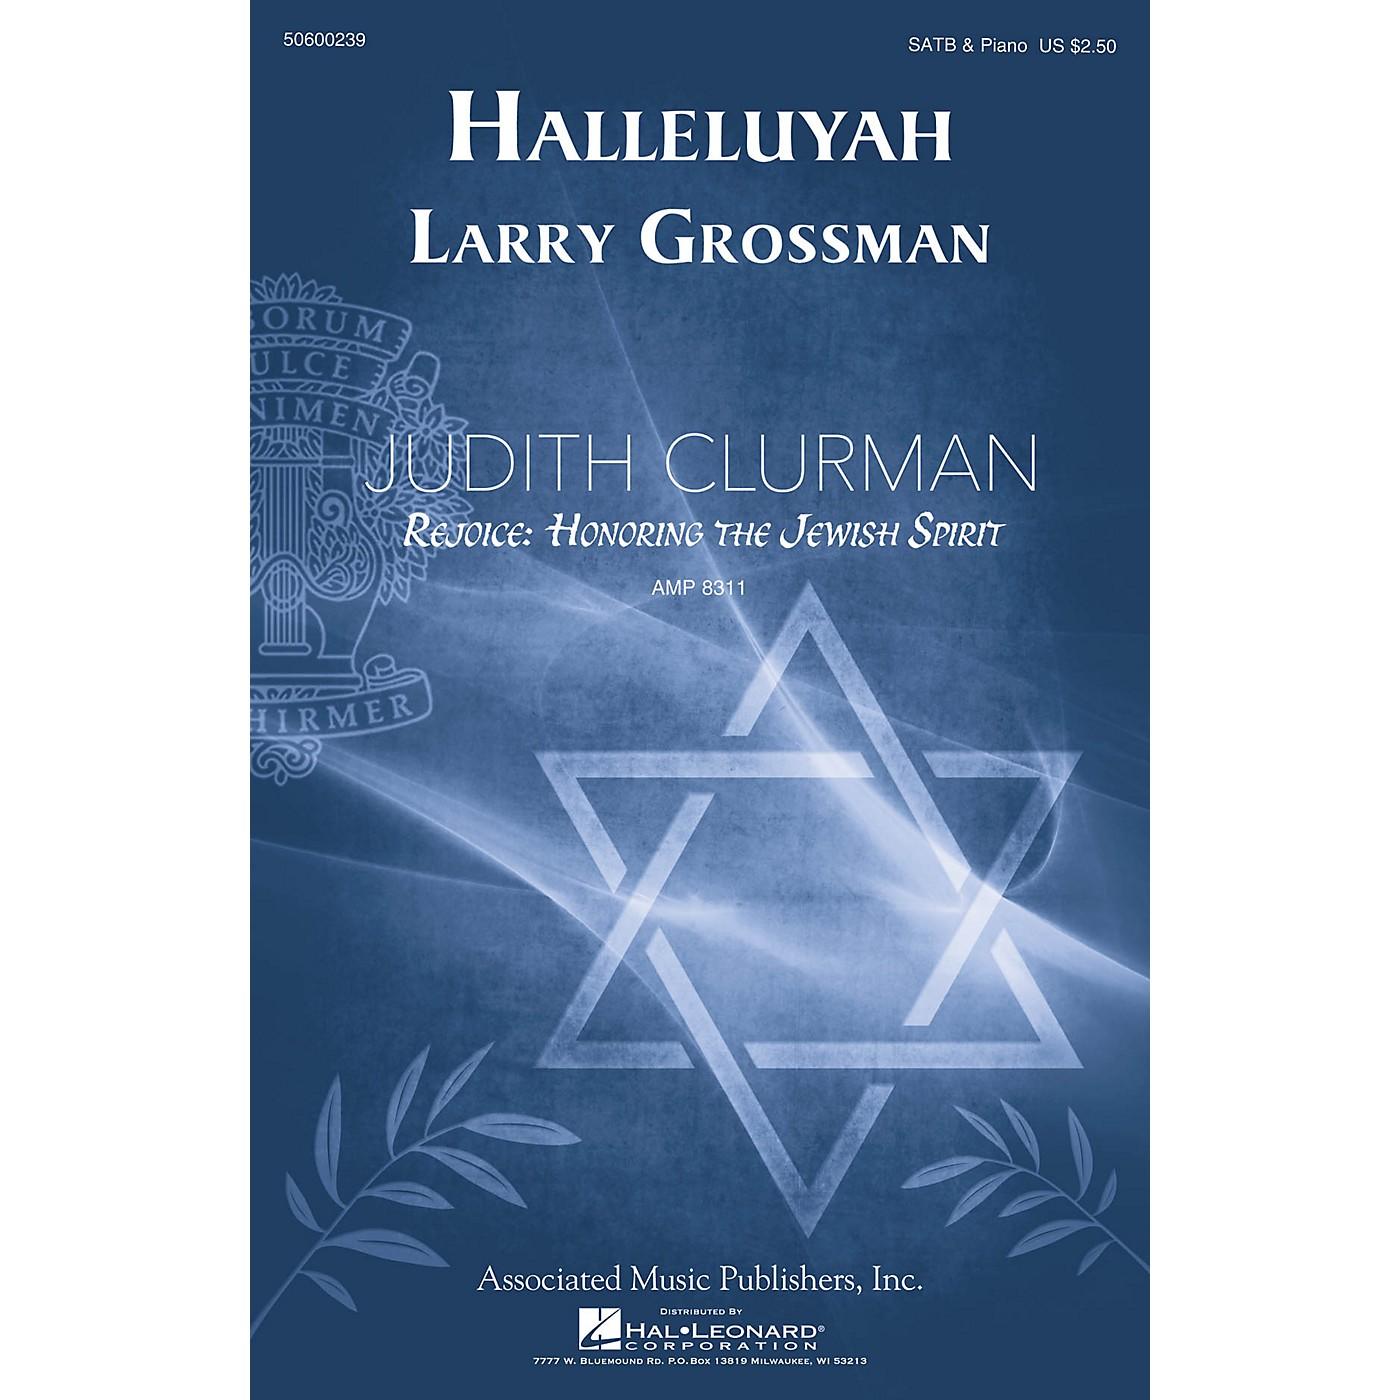 G. Schirmer Halleluyah (Psalm 150) (Judith Clurman Rejoice: Honoring the Jewish Spirit Series) SATB by Larry Grossman thumbnail